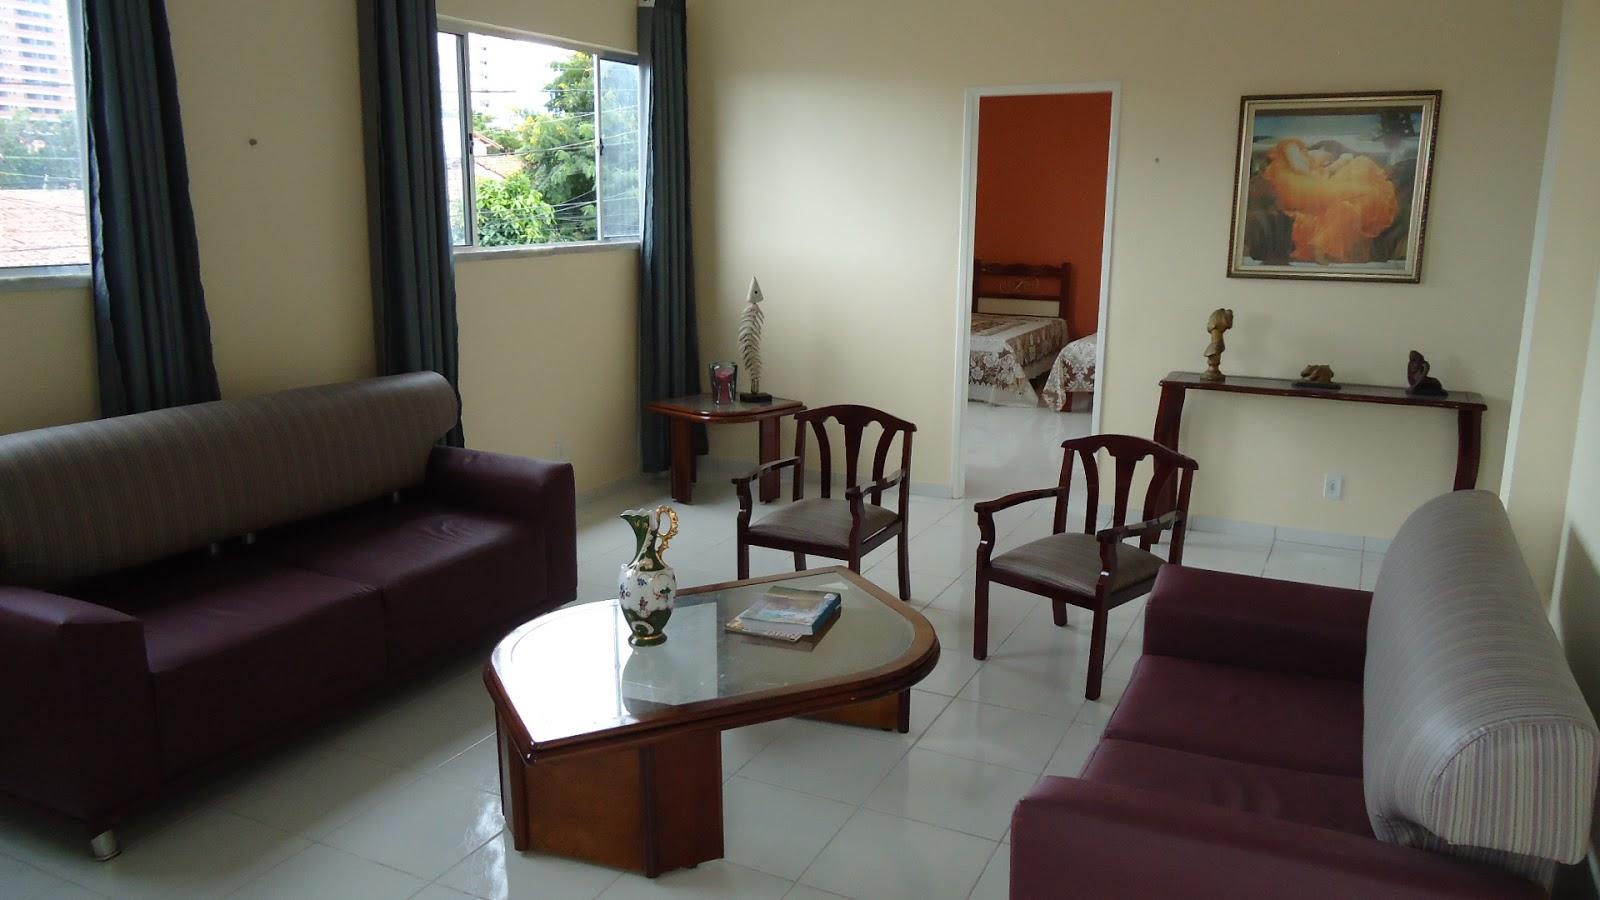 Sala de estar do Pensionato Lar das meninax - Fortaleza-CE